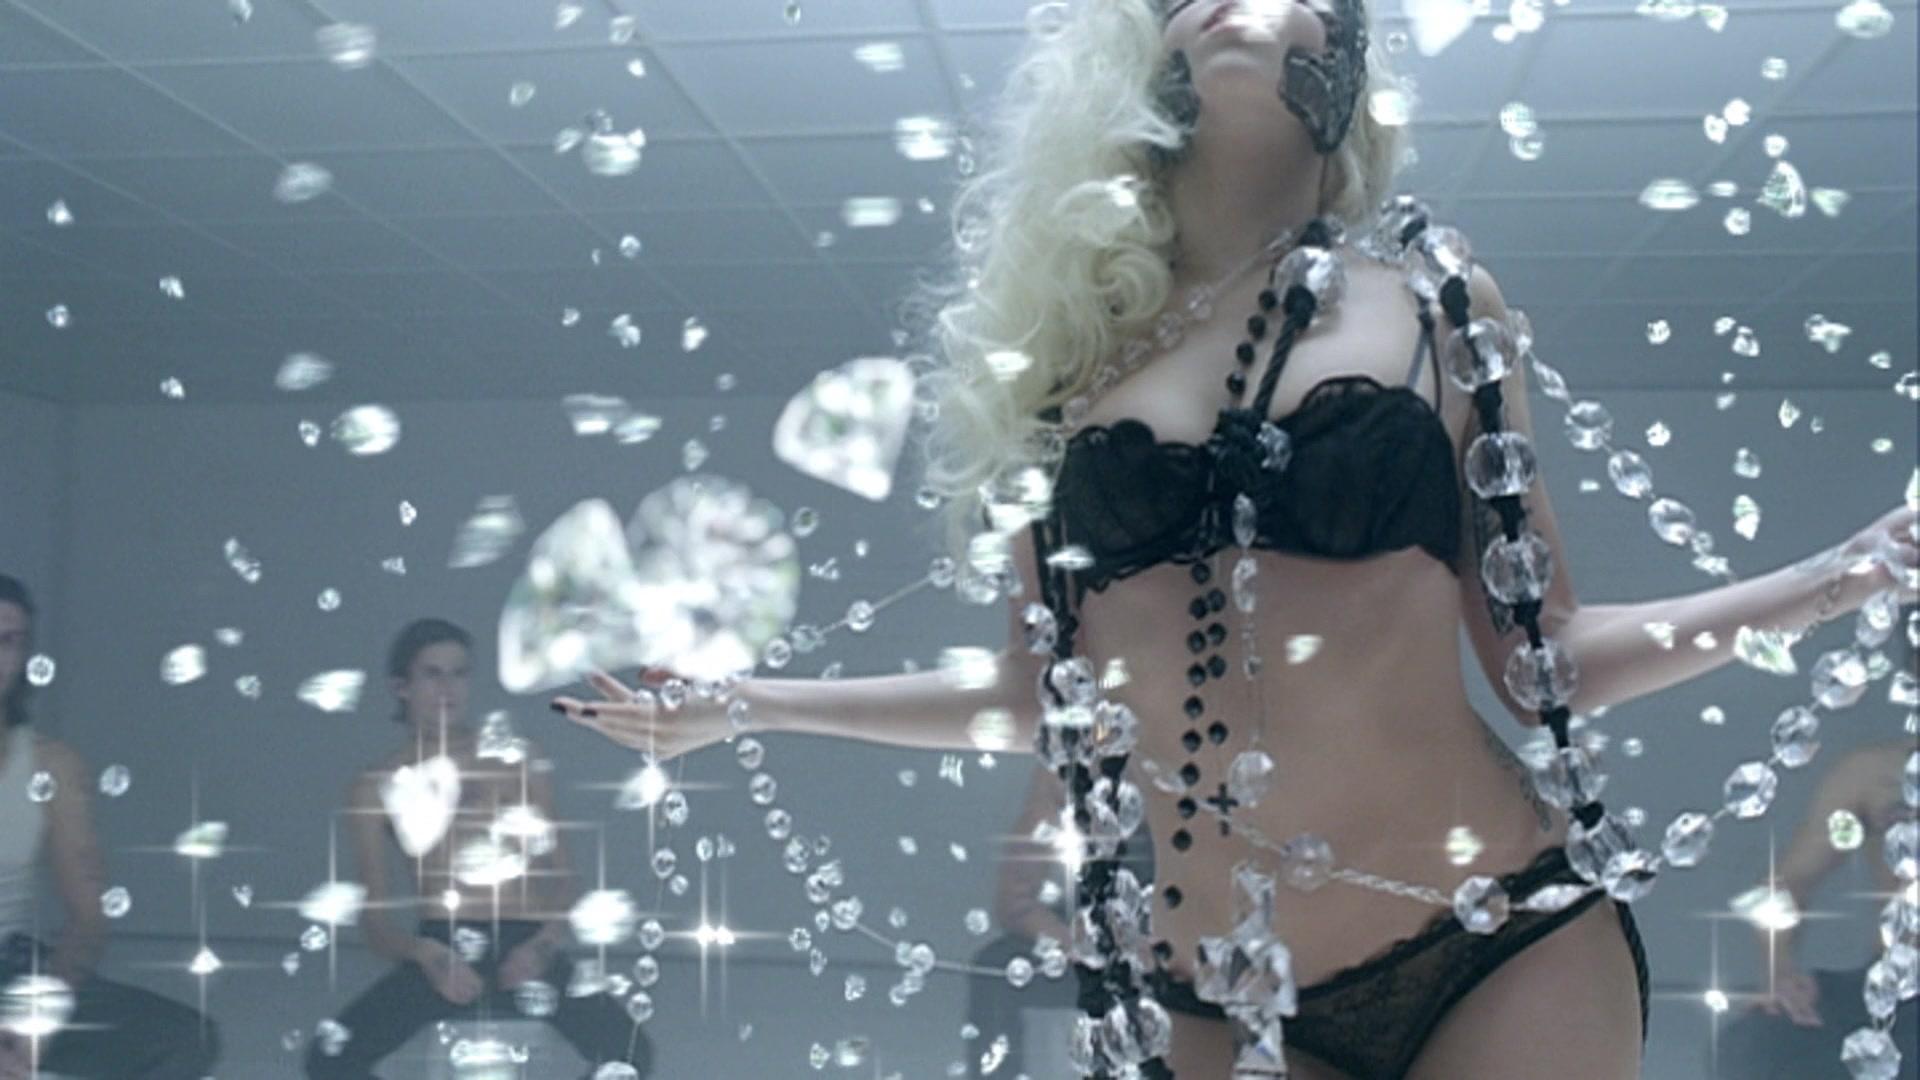 File:Lady Gaga - Bad Romance 028.jpg